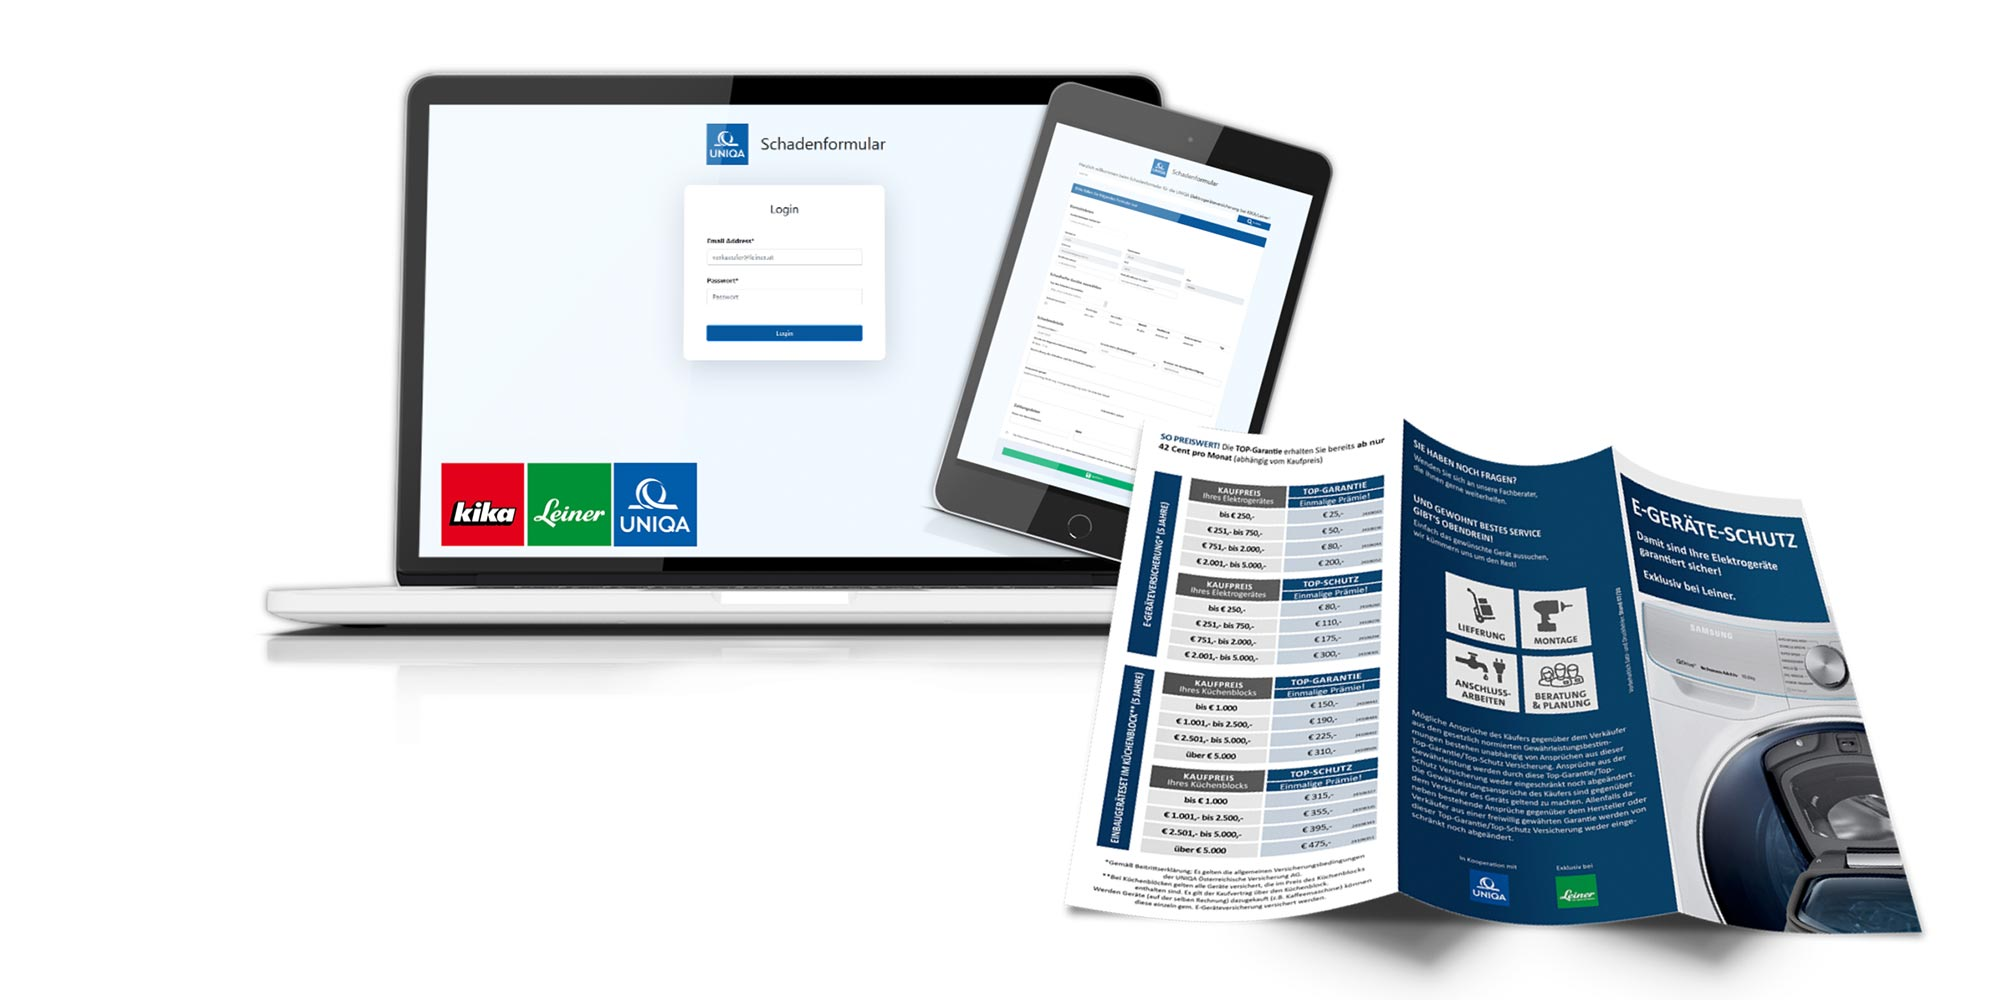 UNIQA - bsurance -kika/Leiner Extended warranty insurance